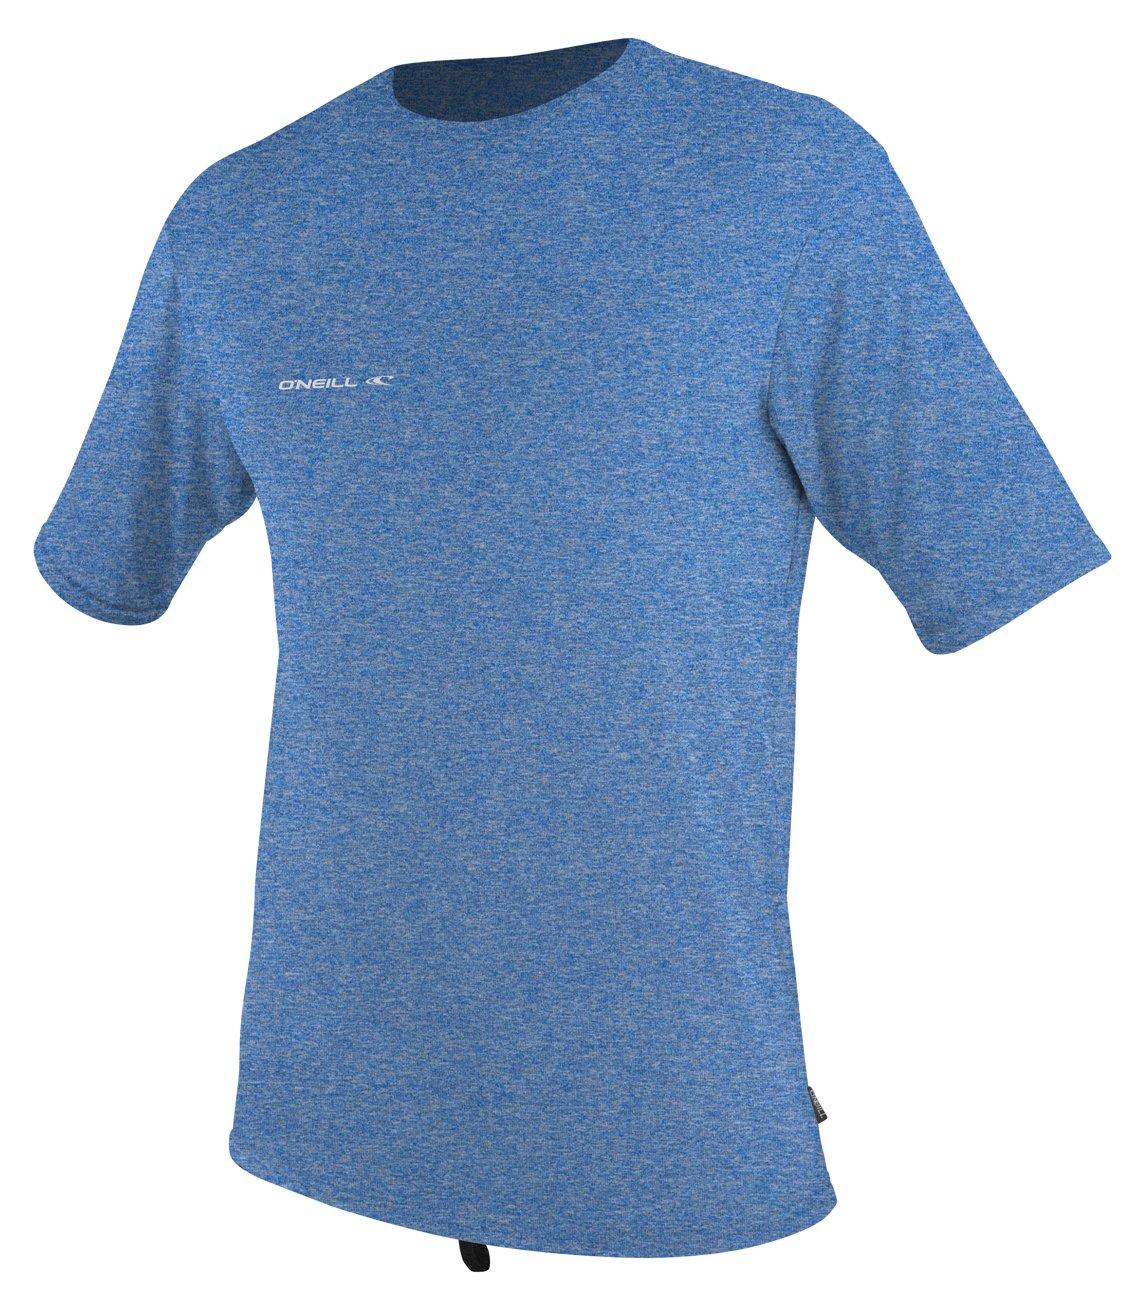 O'Neill  Men's Hybrid UPF 50+ Short Sleeve Sun Shirt, Blue,Medium by O'Neill Wetsuits (Image #1)